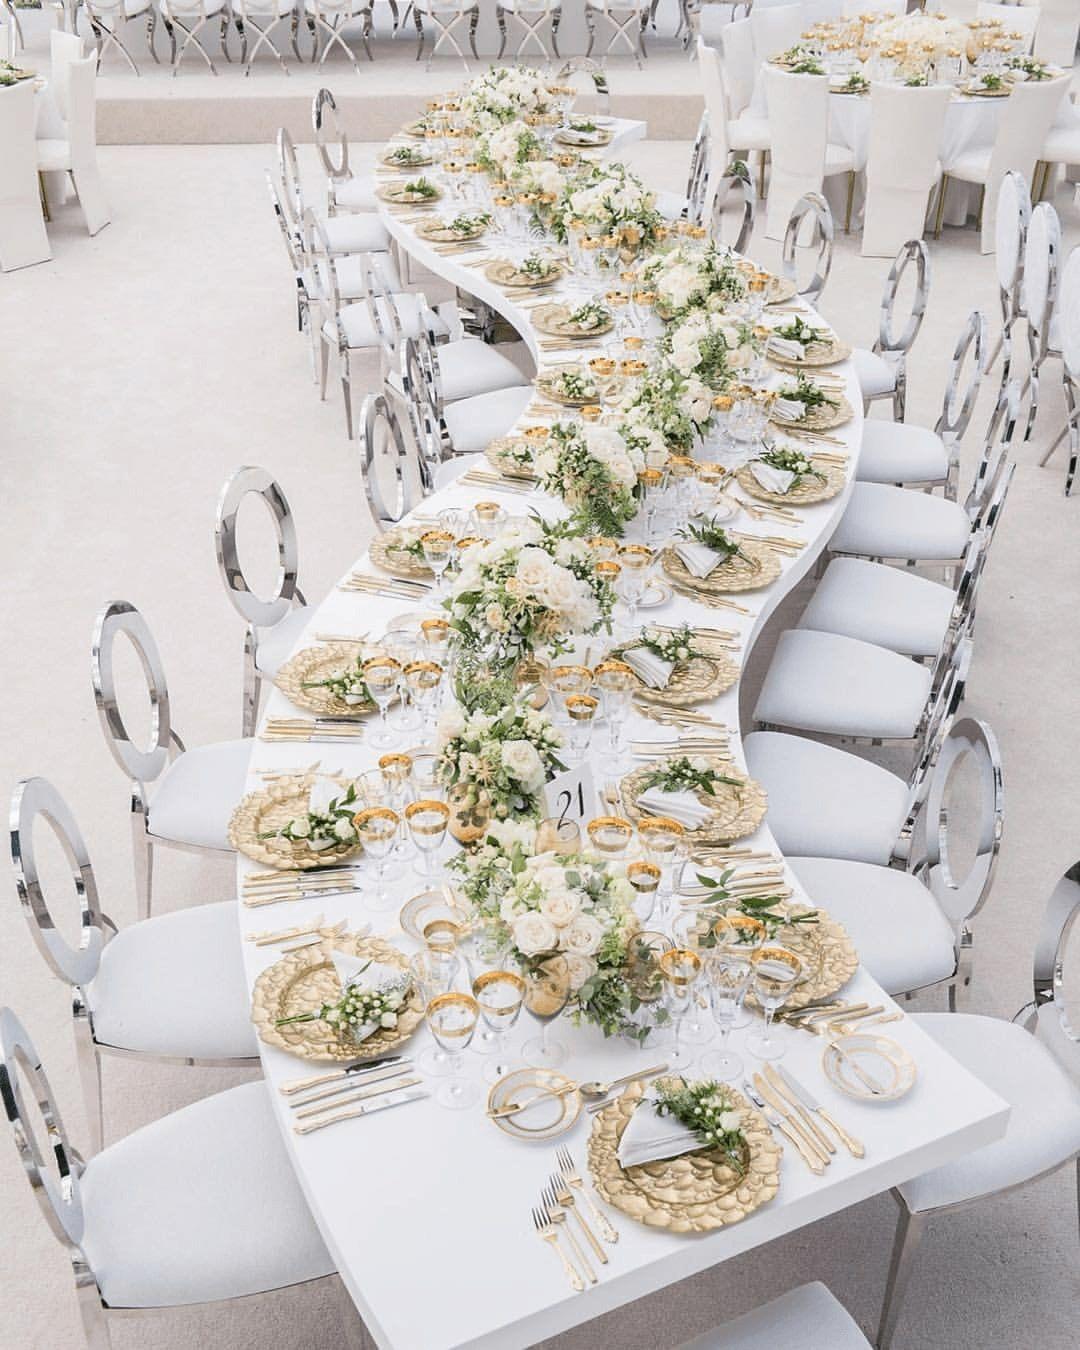 10 Perfete Wedding Trends For The 2019 Wedding Season Perfete Natural Wedding Decor Wedding Decor Inspiration Luxury Wedding Decor